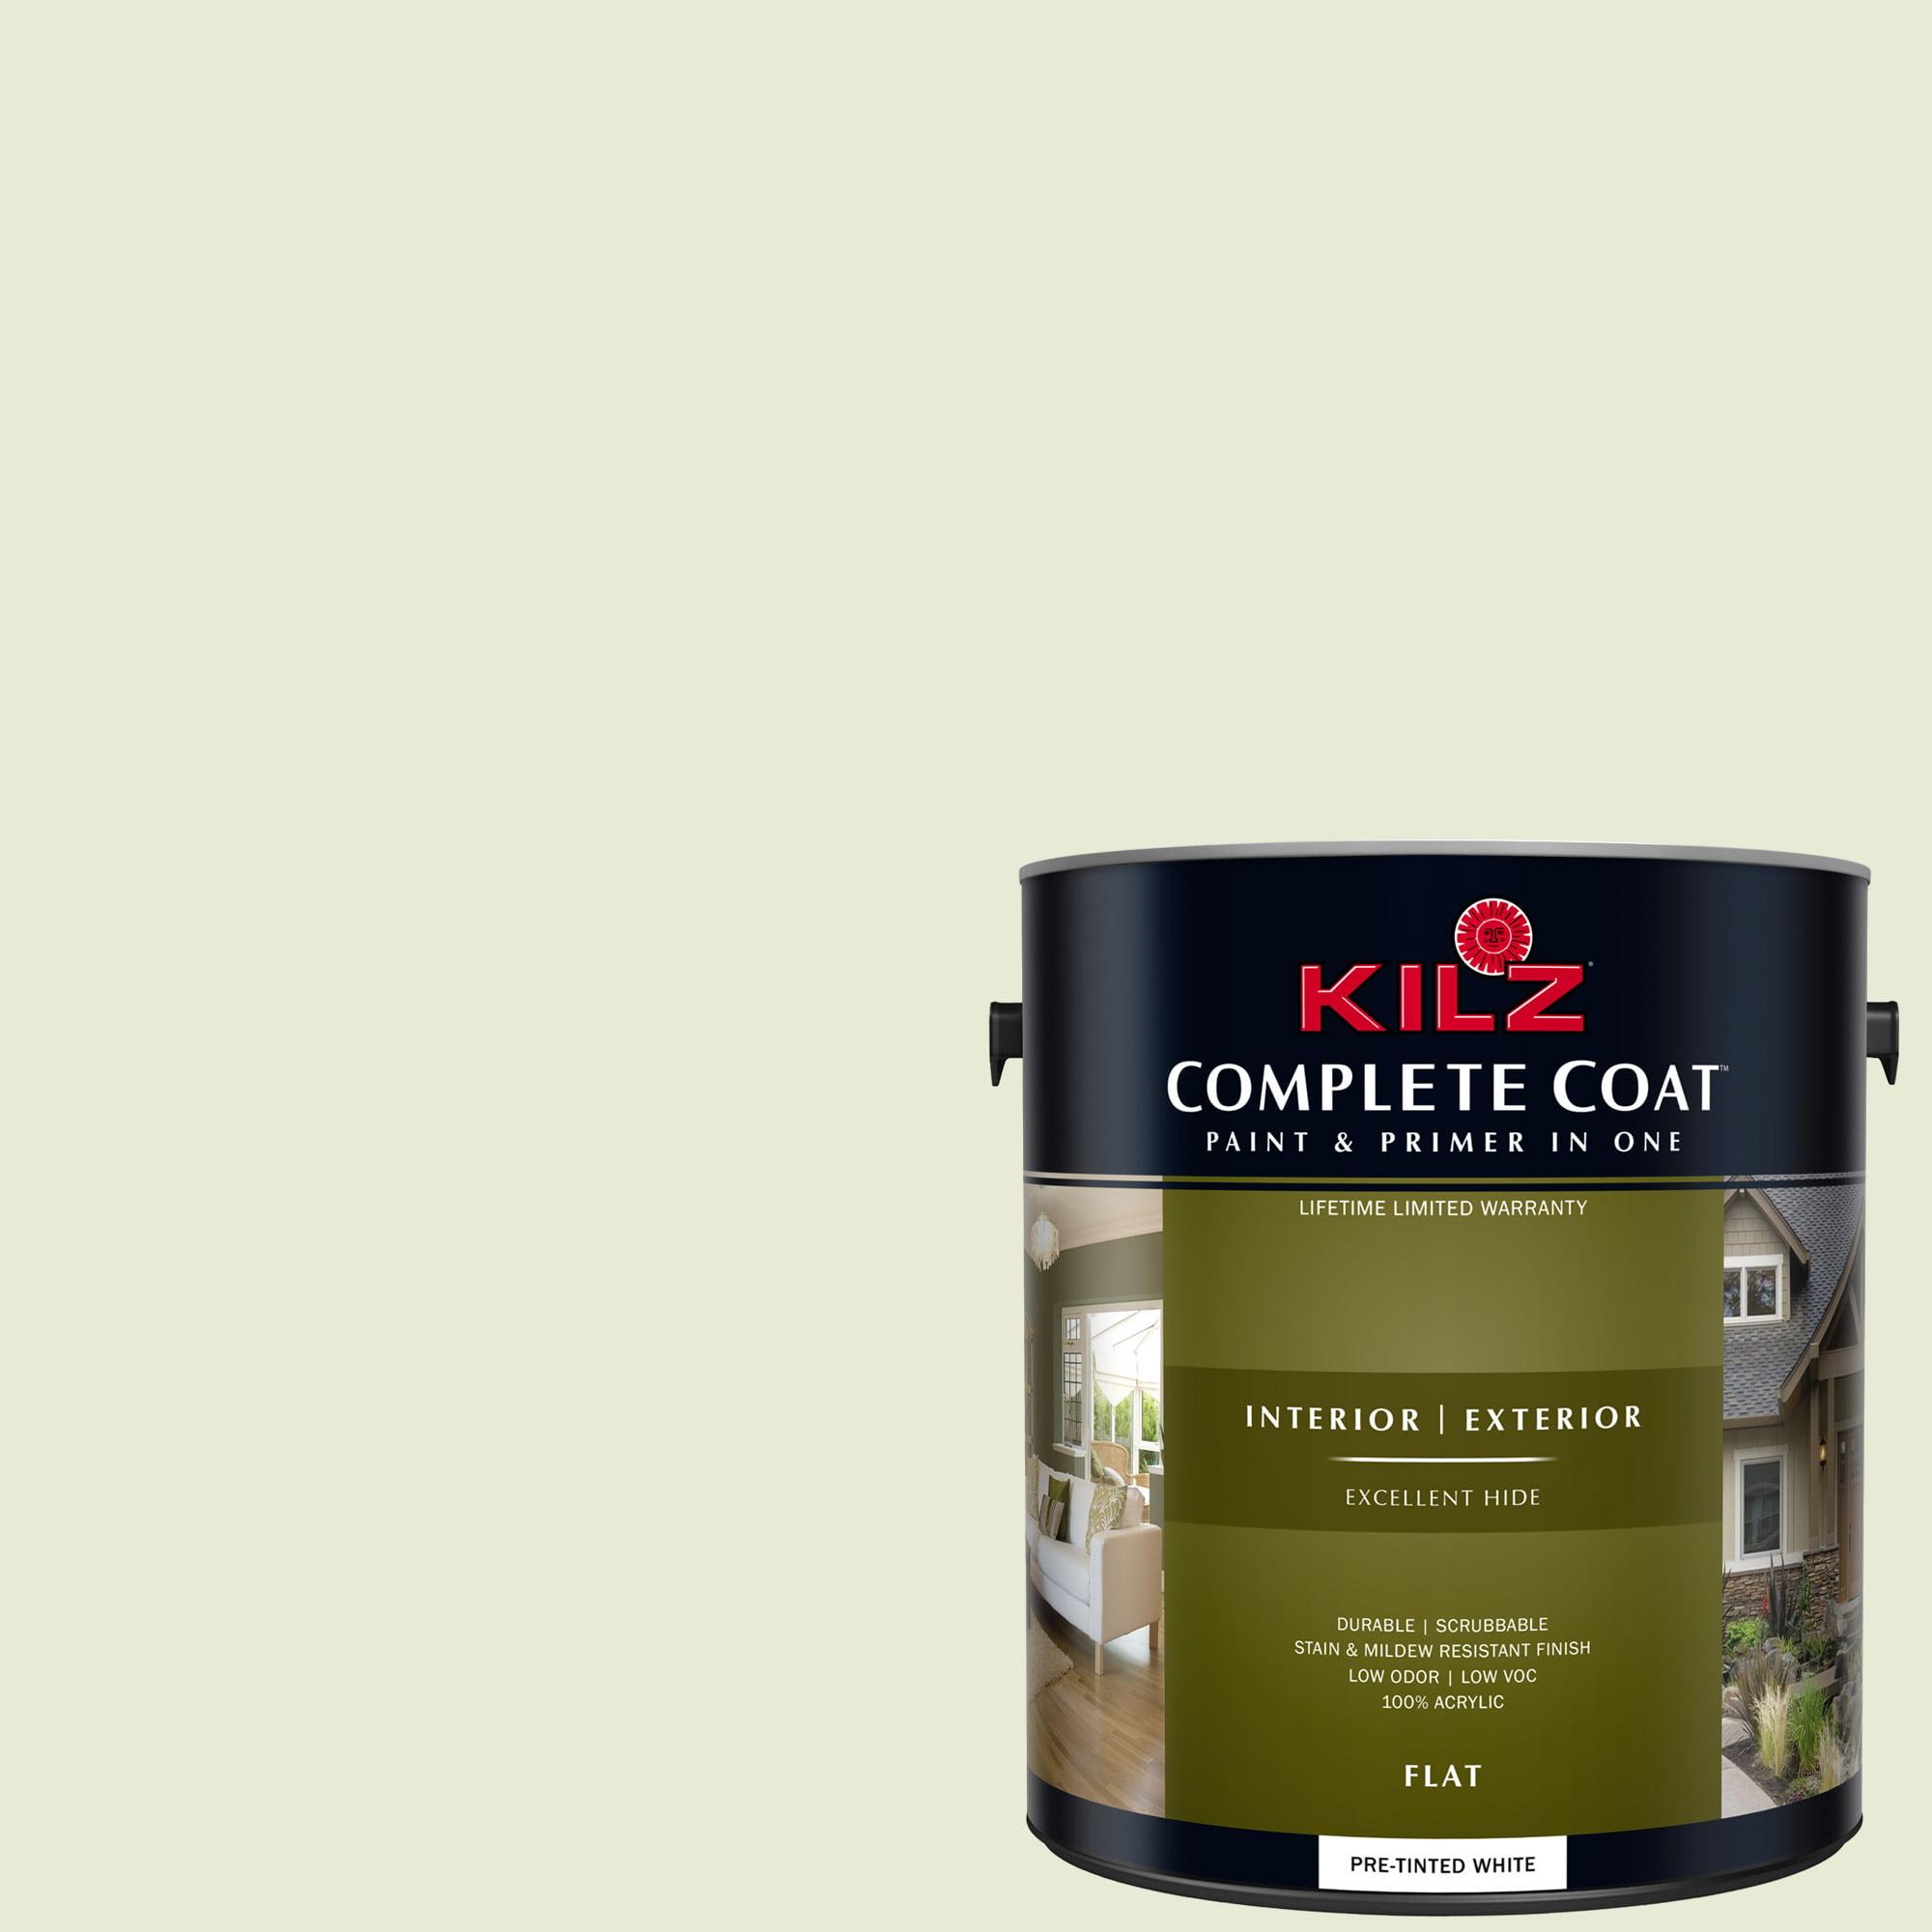 KILZ COMPLETE COAT Interior/Exterior Paint & Primer in One #LF200-02 Healing Springs